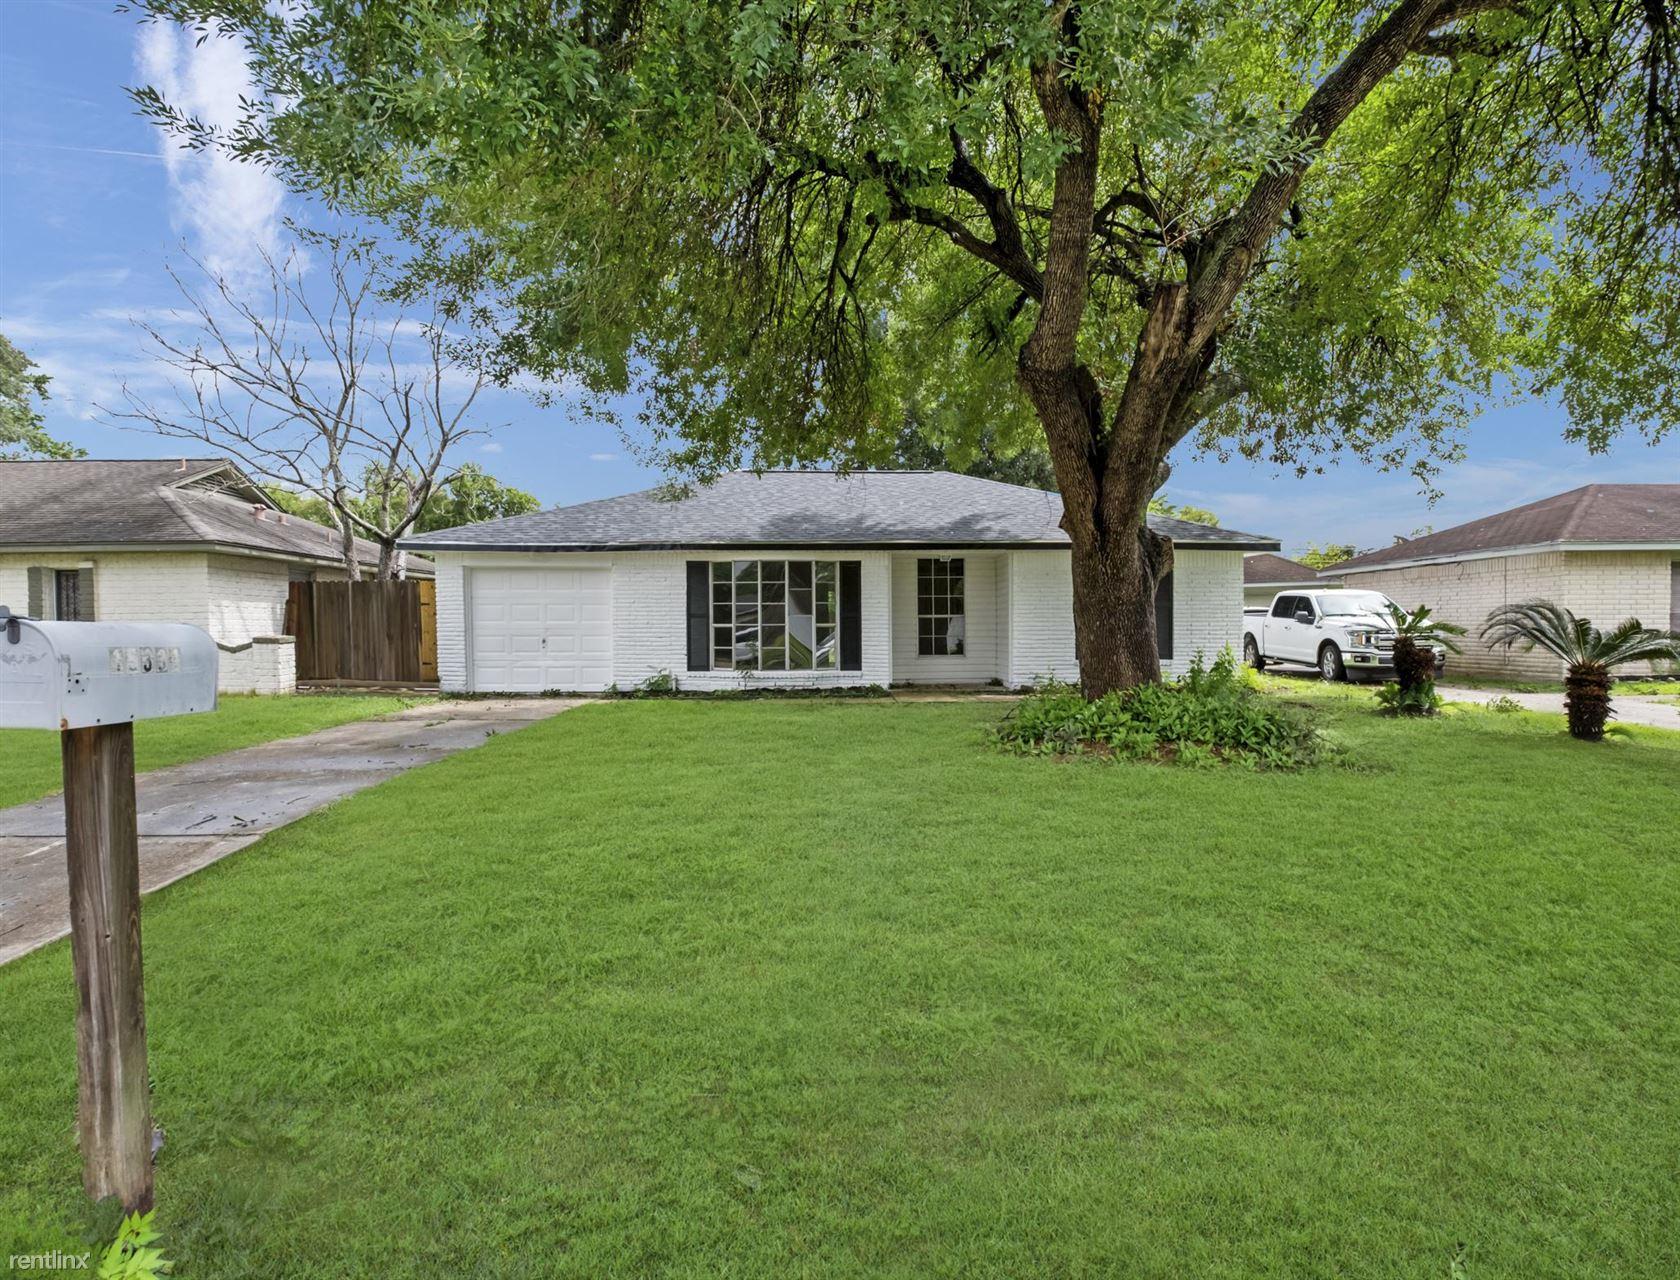 15331 Campden Hill Rd, Houston, TX - 1,400 USD/ month